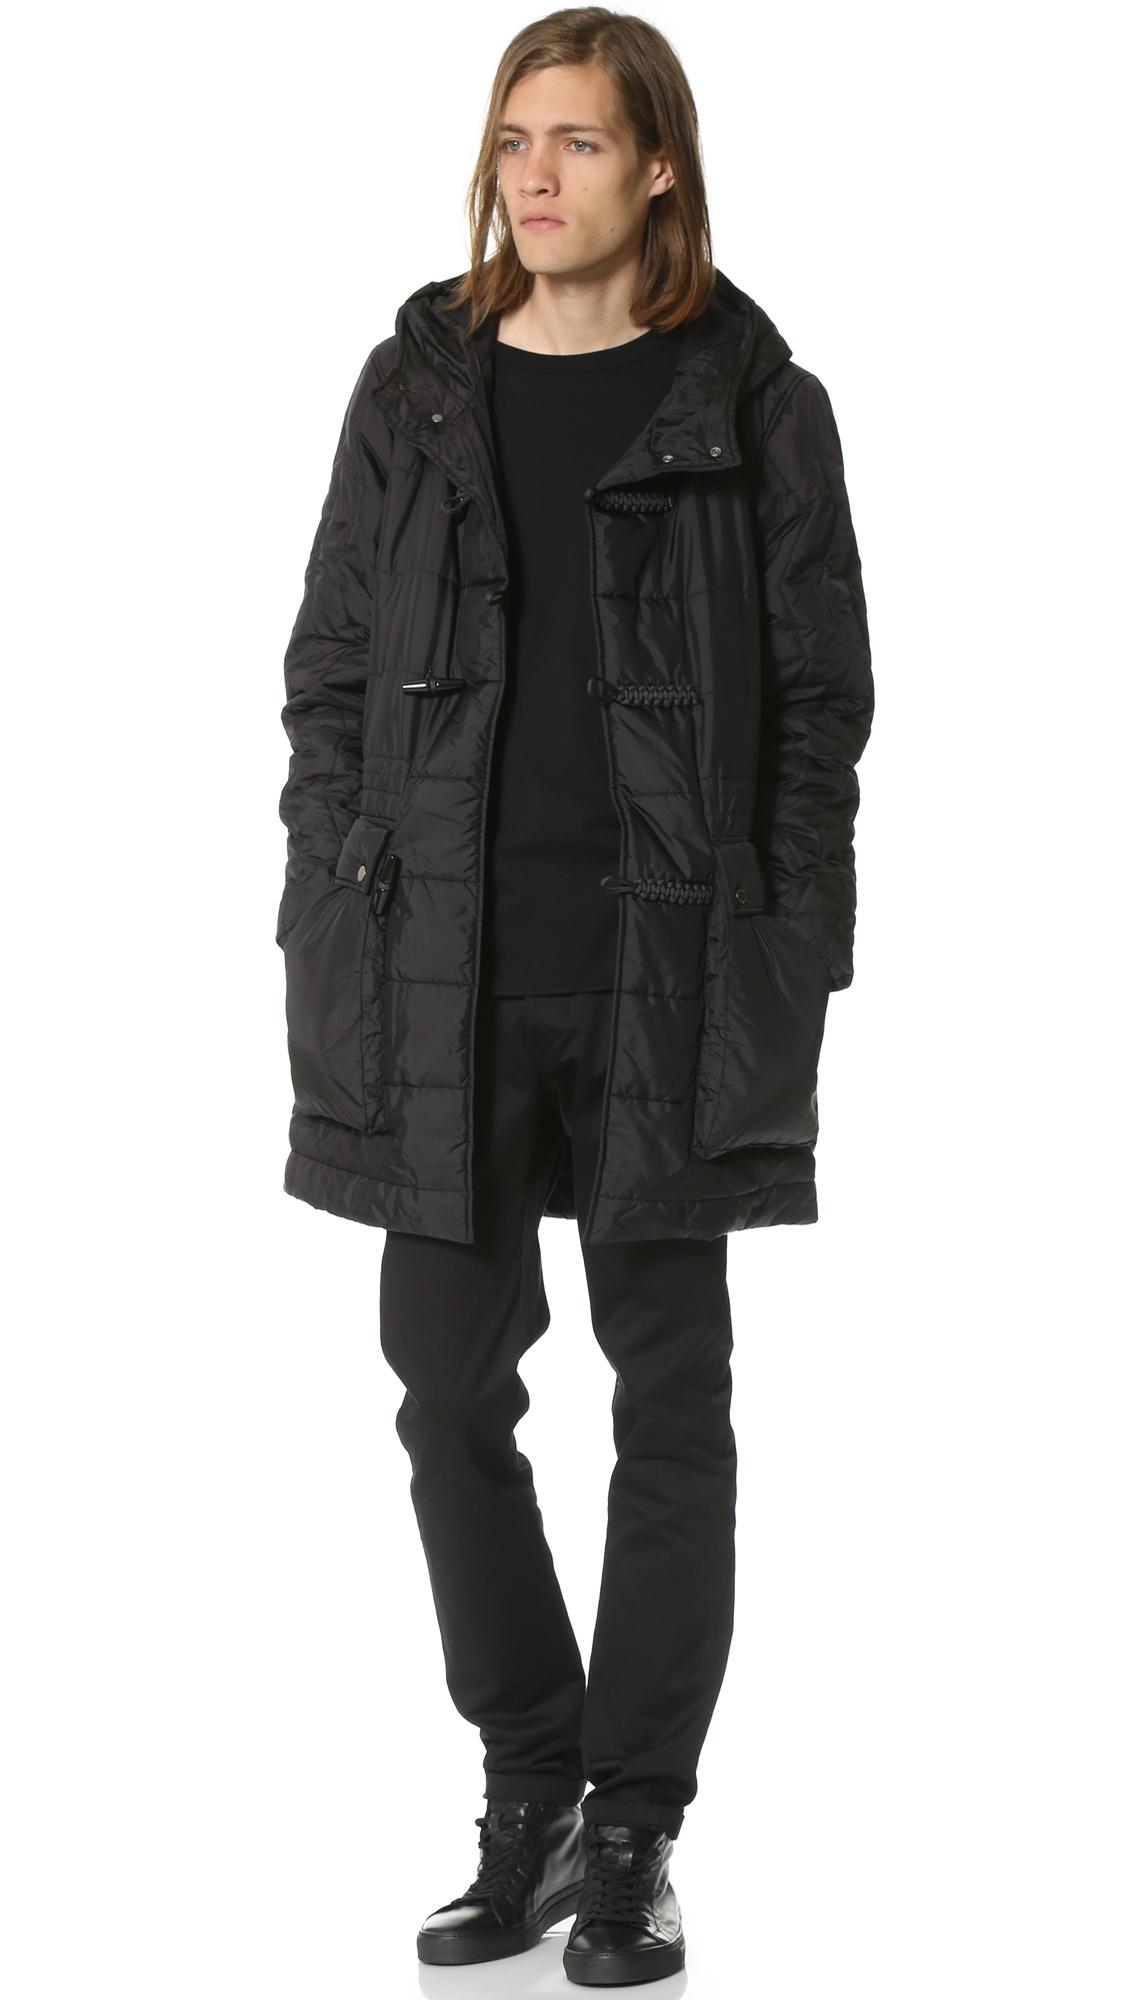 Christopher raeburn Quilted Duffle Coat in Black for Men | Lyst